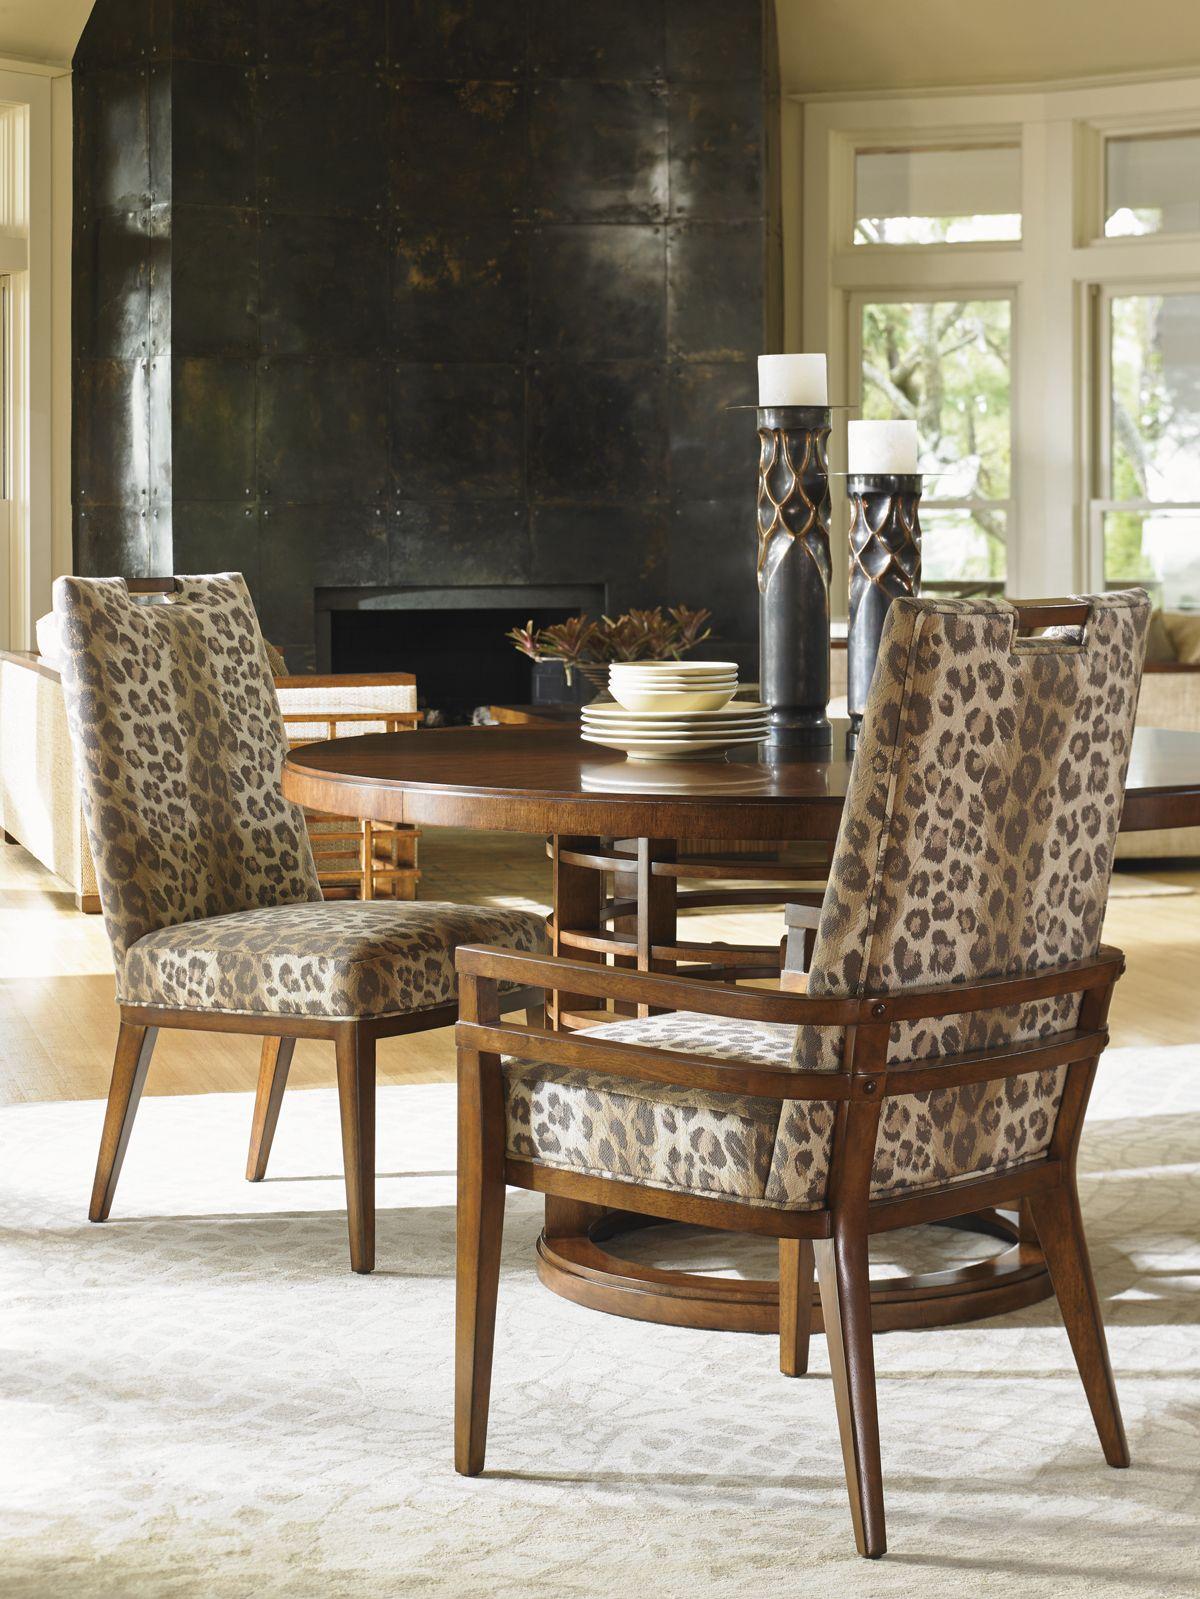 Design500667 Leopard Print Dining Chairs Design540267 Animal . - Animal Print Dining Room Chairs ~ Ktvb.us